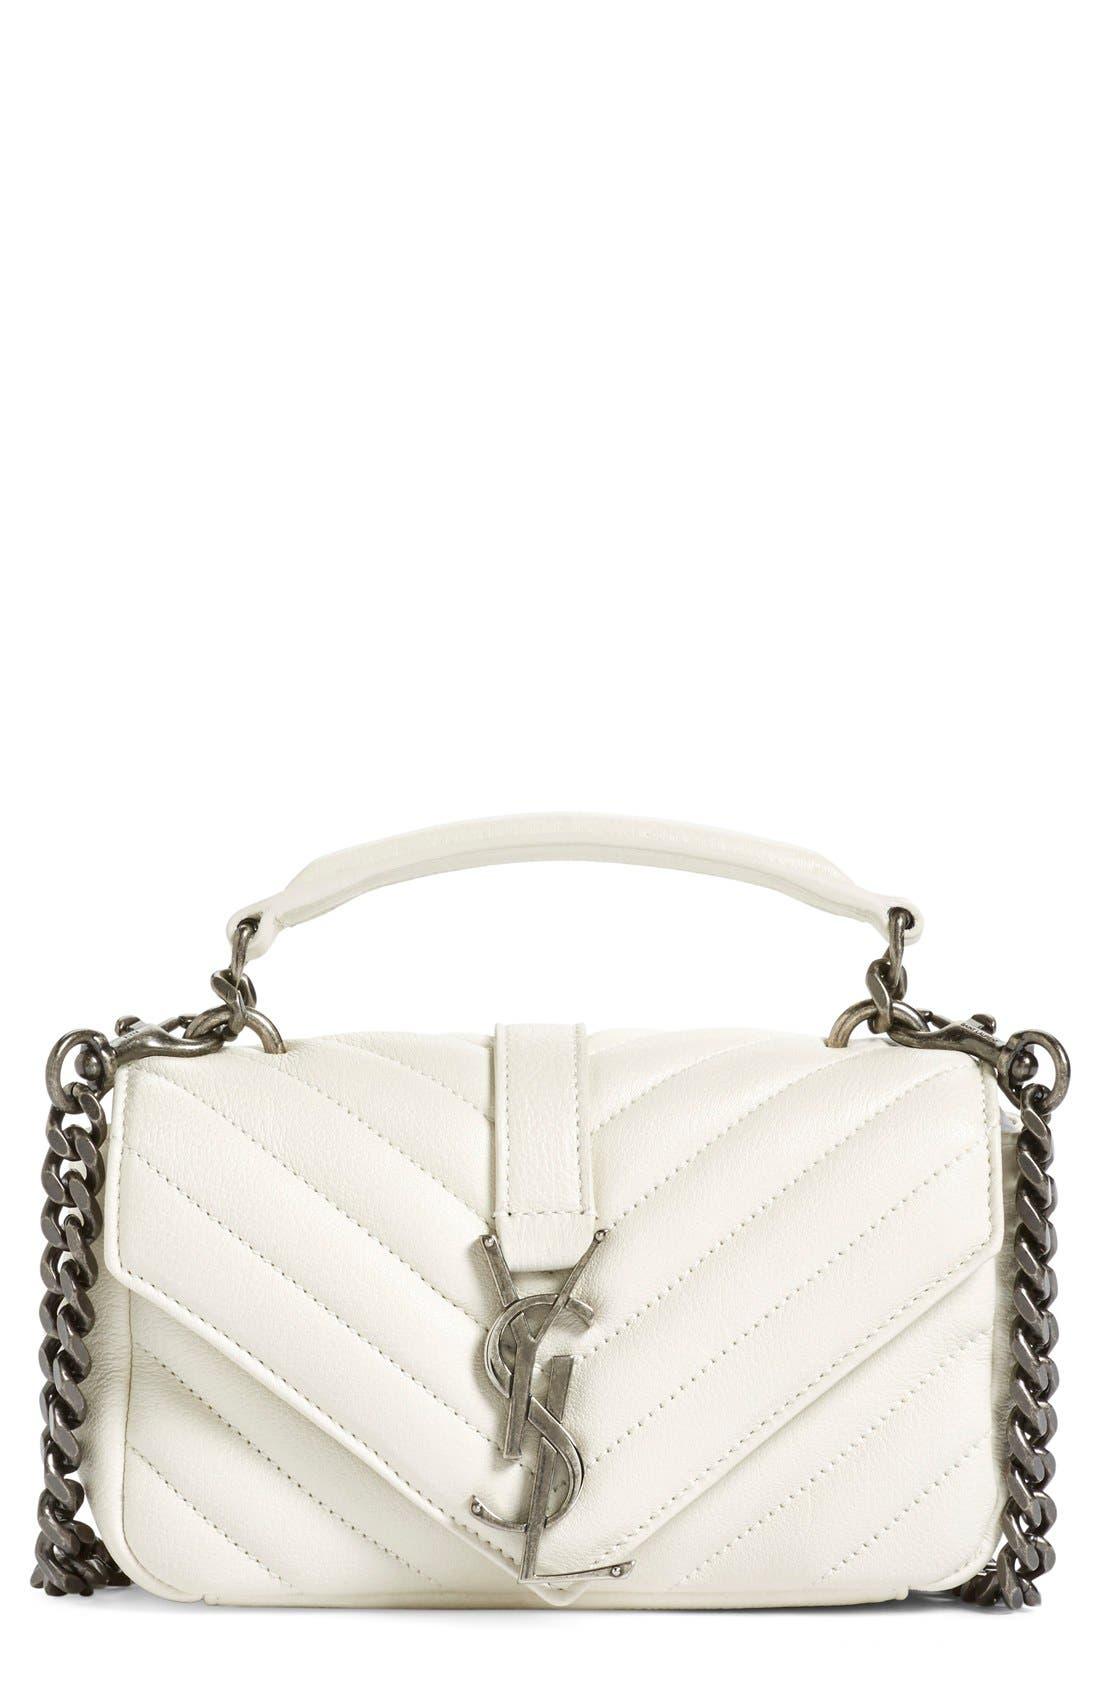 Main Image - Saint Laurent 'Monogram' Shoulder Bag